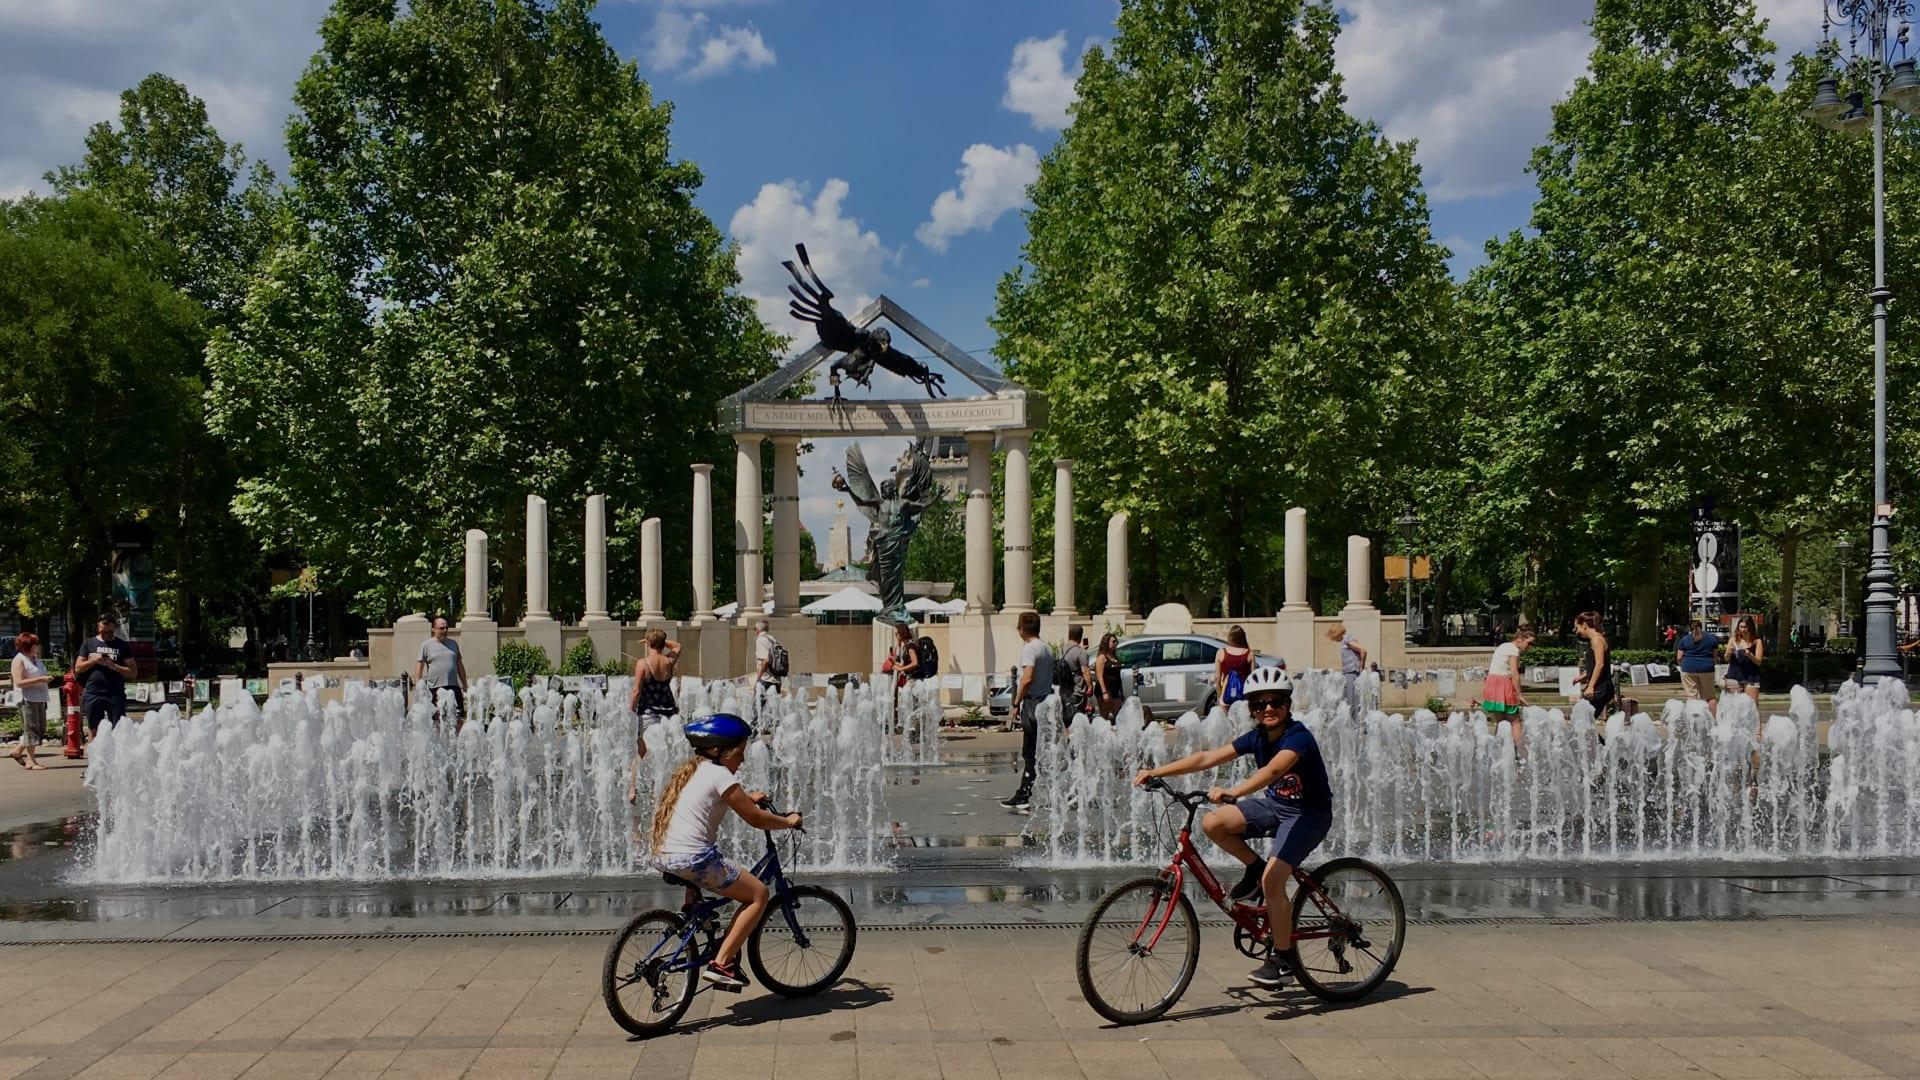 Madrid's Fun Ride: Family Friendly Bike Tour - Madrid